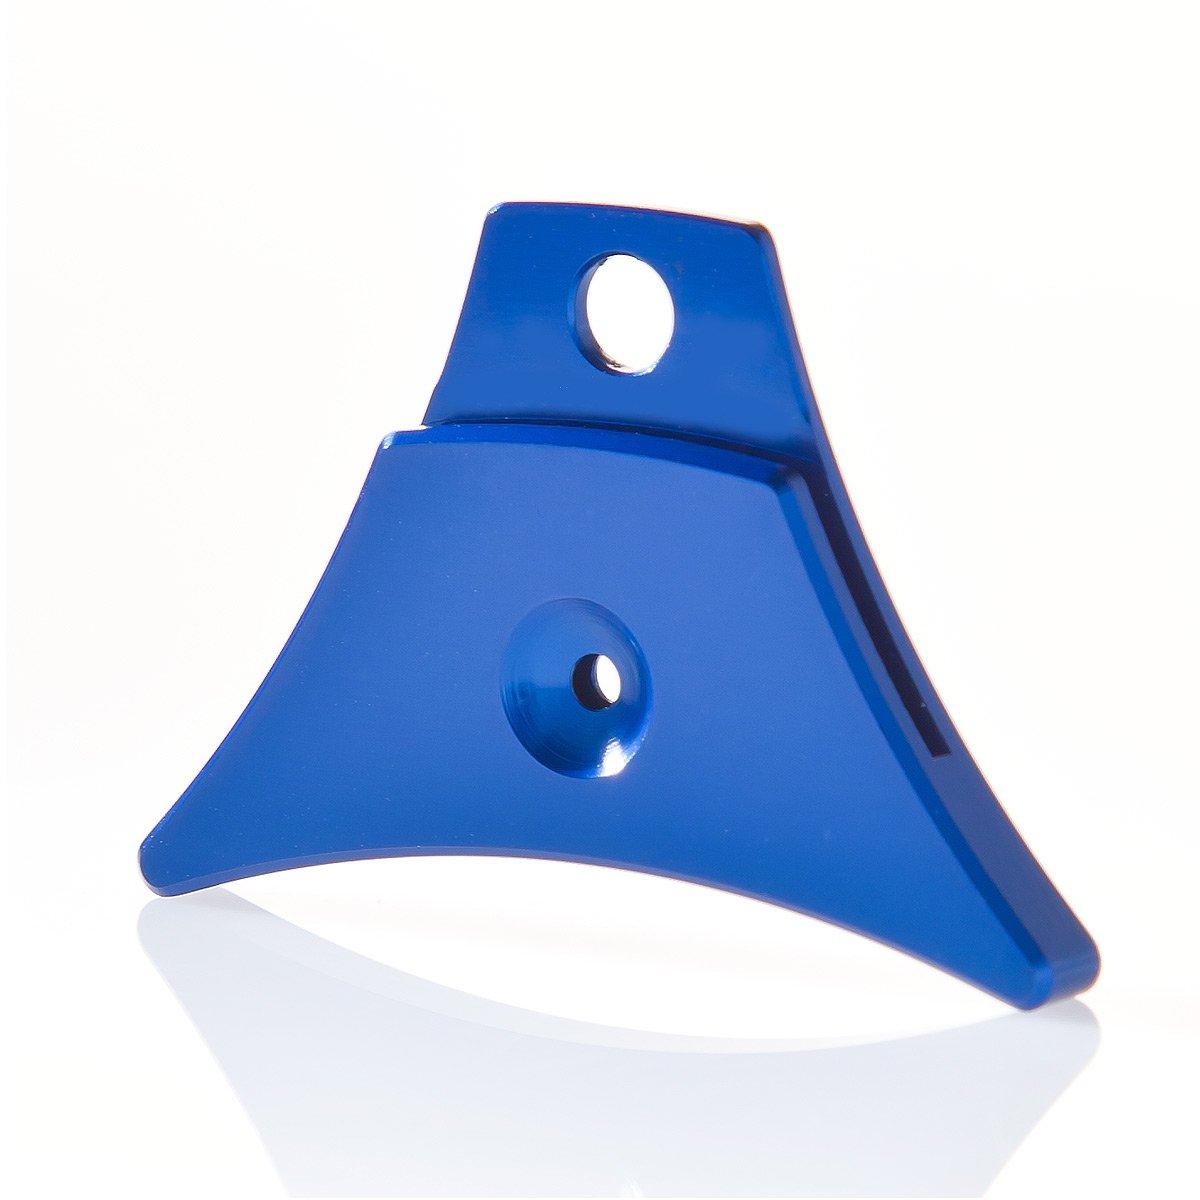 Logan A1 Whistle (Blue)